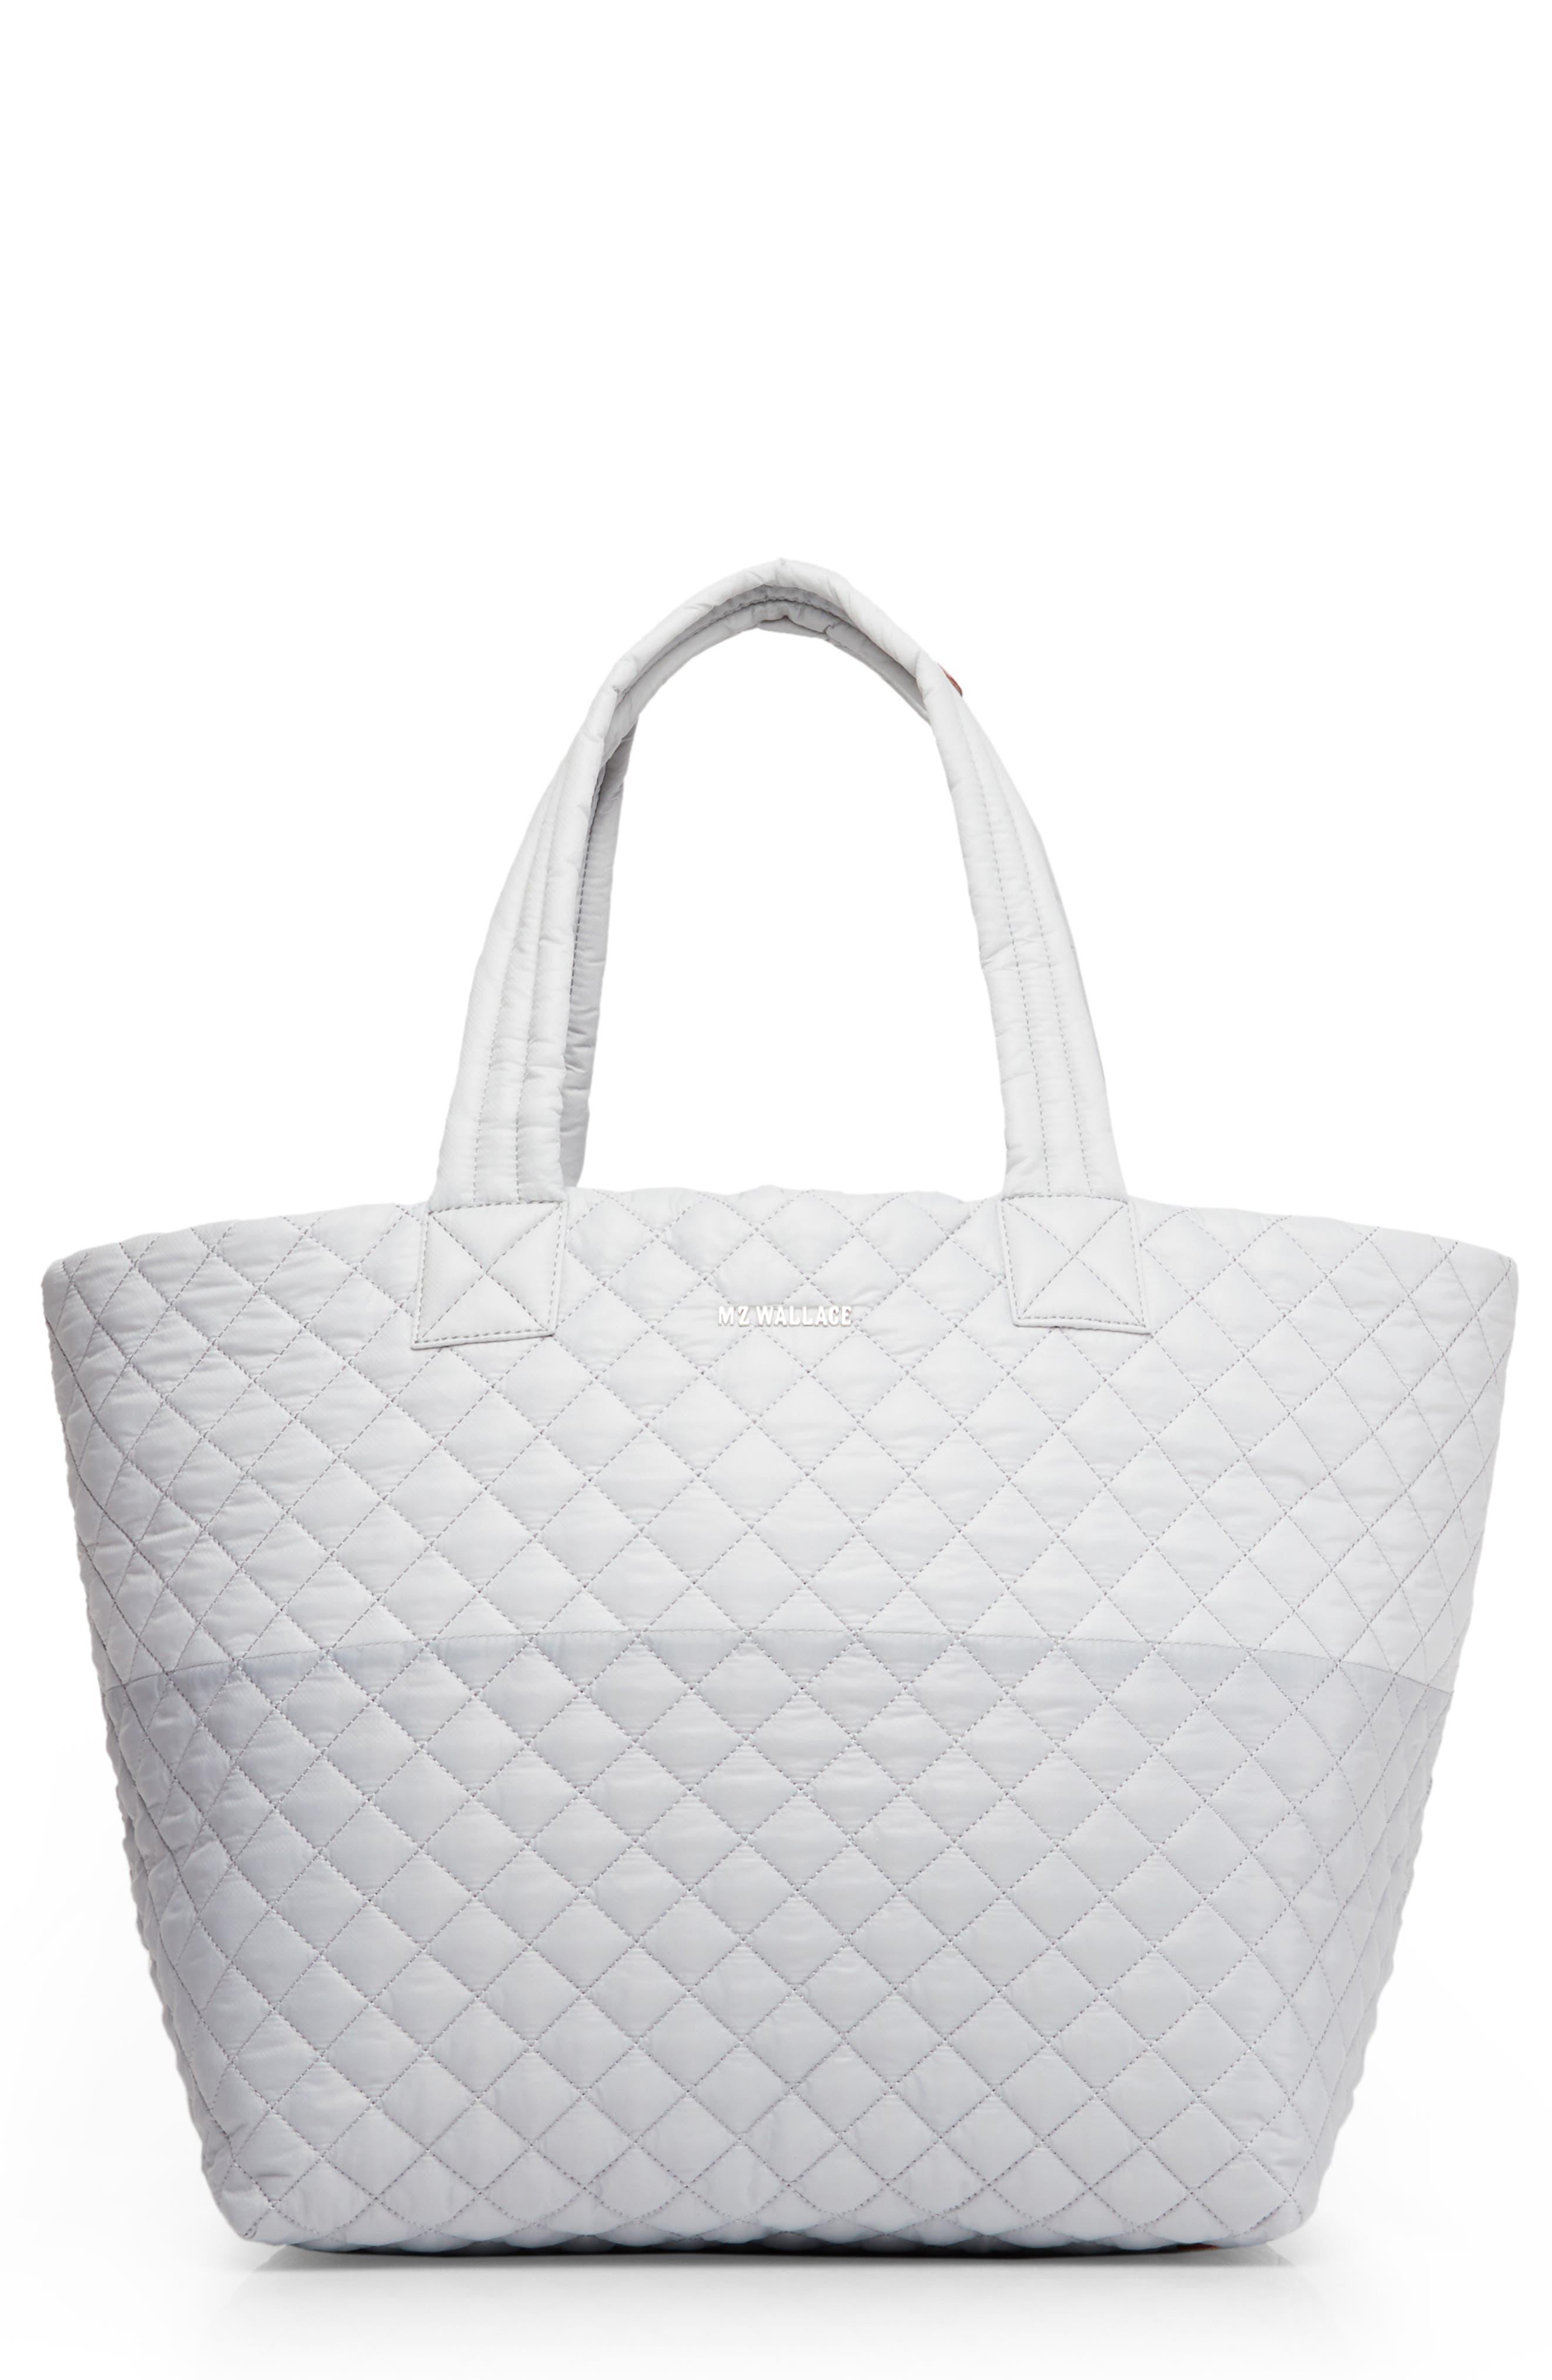 612efb1b405559 Handbags & Purses | Nordstrom